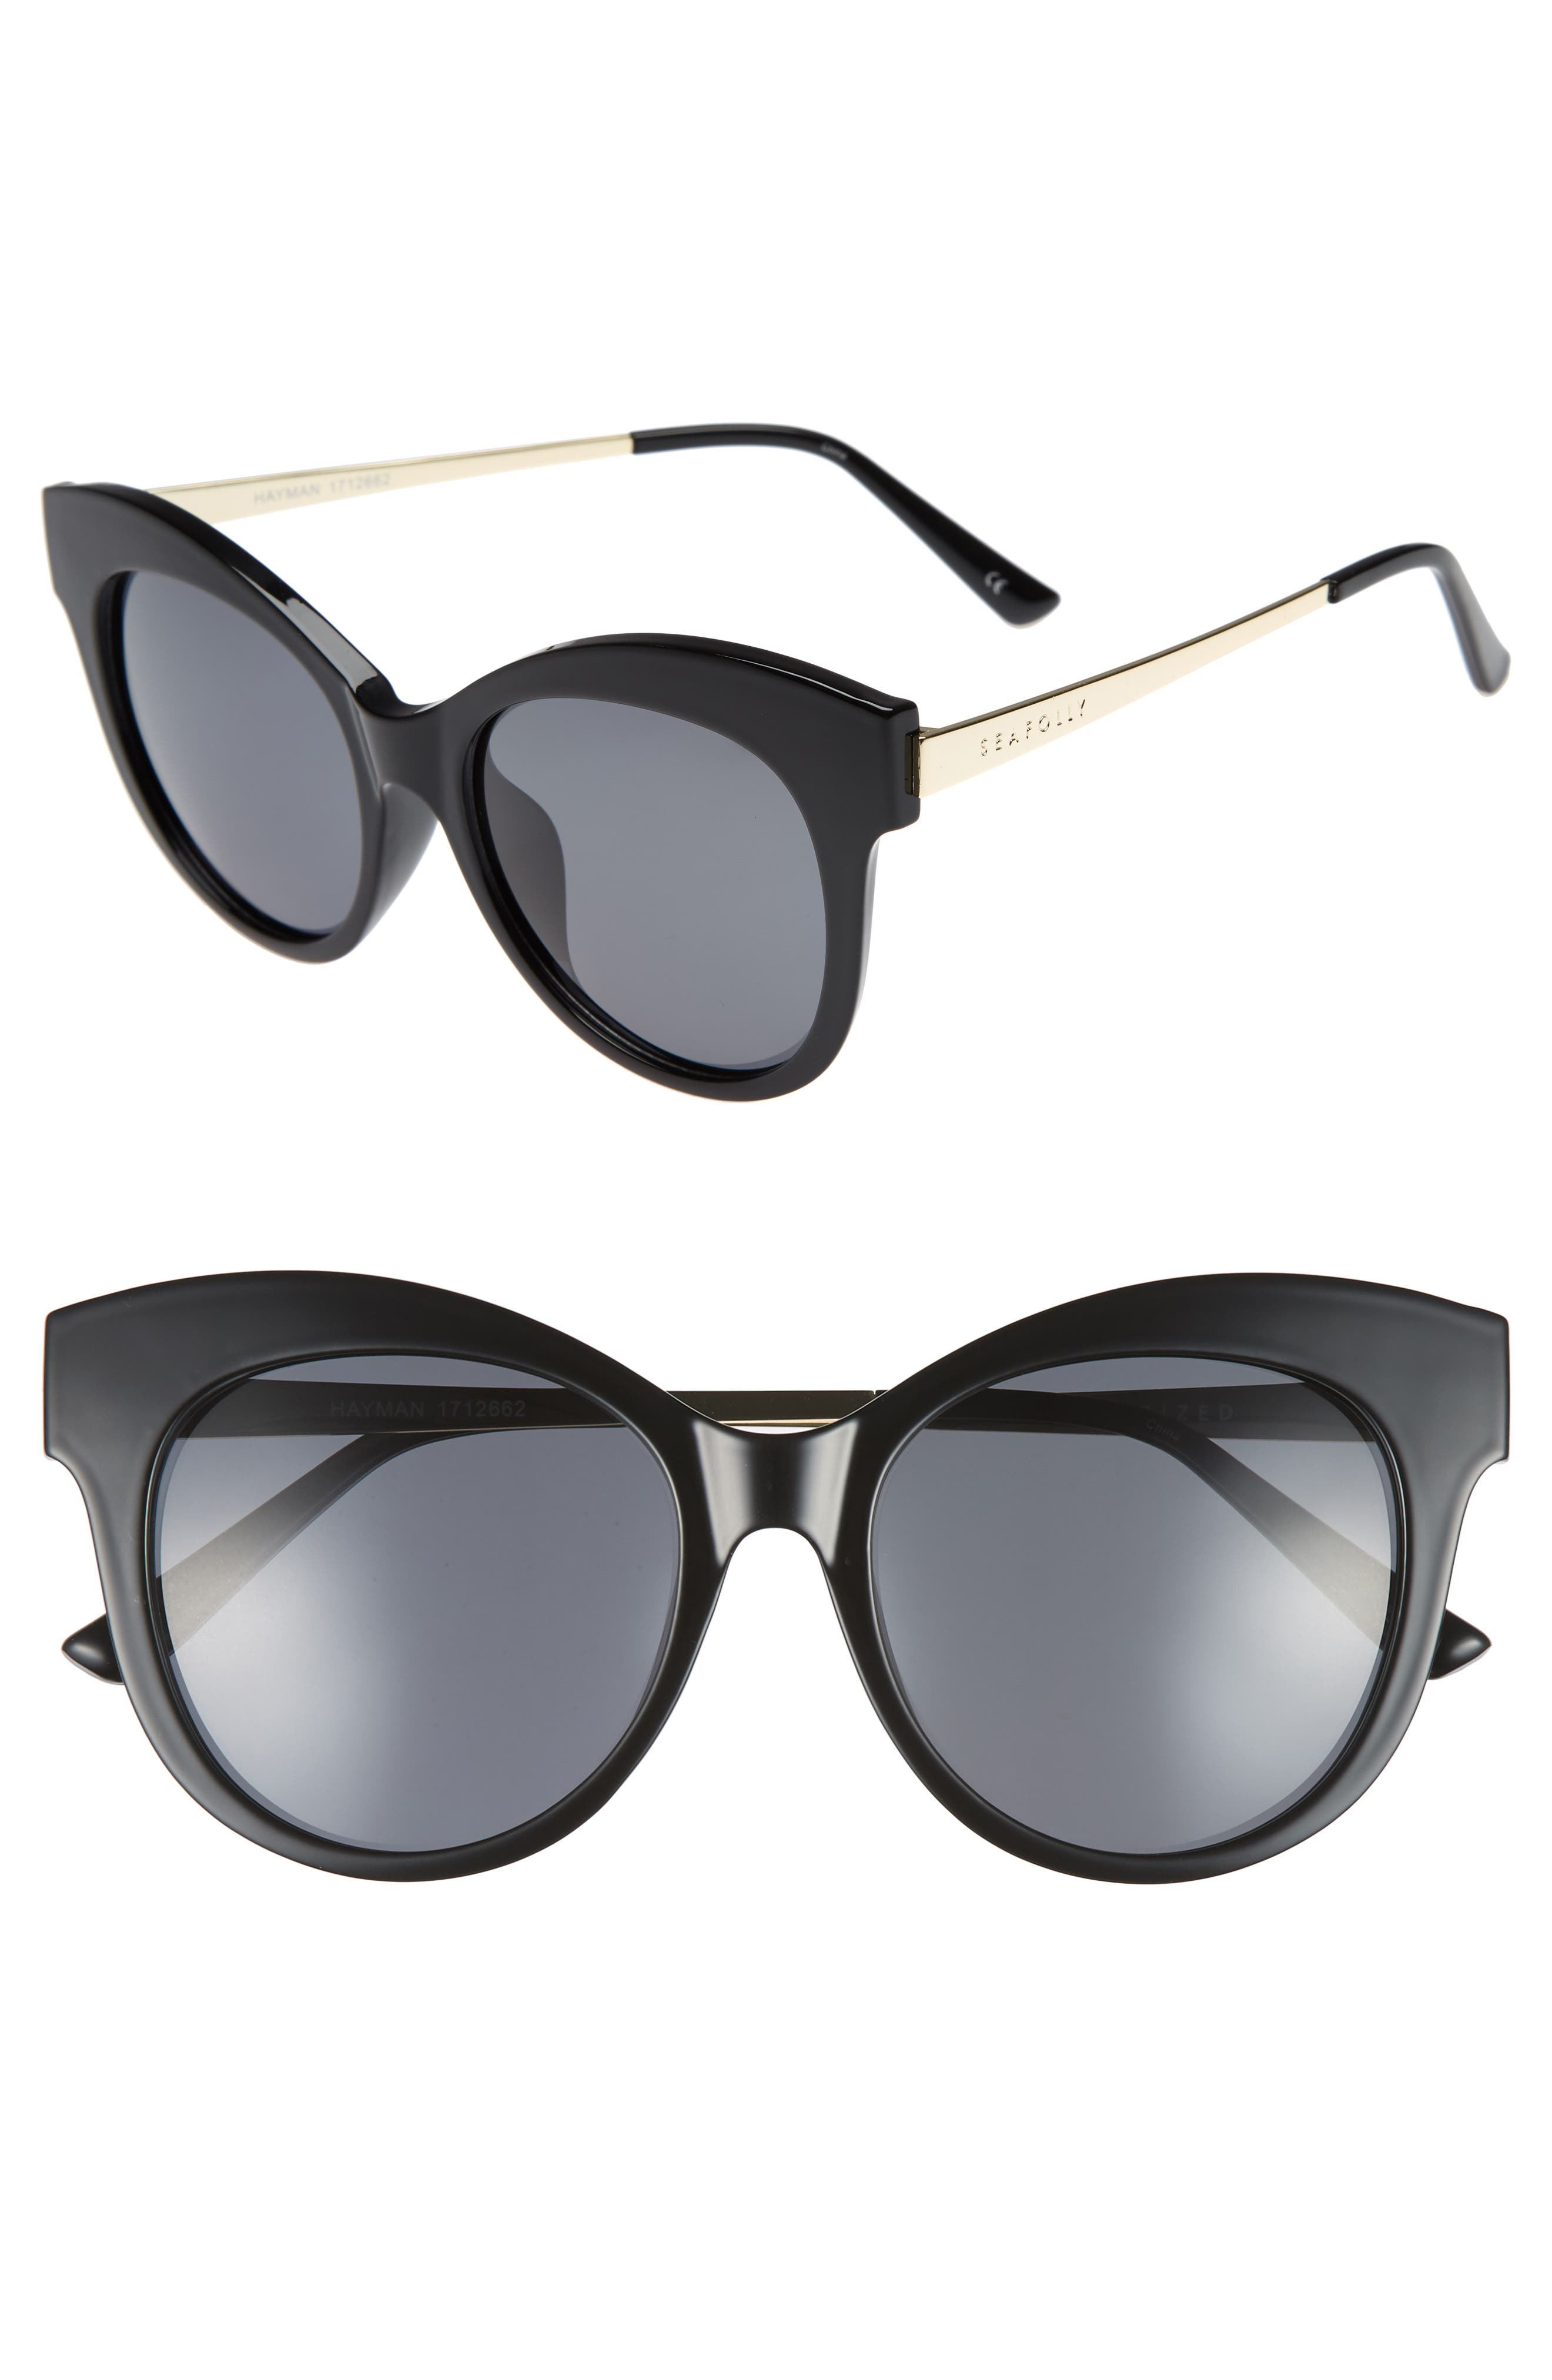 Hayman 53mm Cat Eye Sunglasses,                             Main thumbnail 1, color,                             BLACK